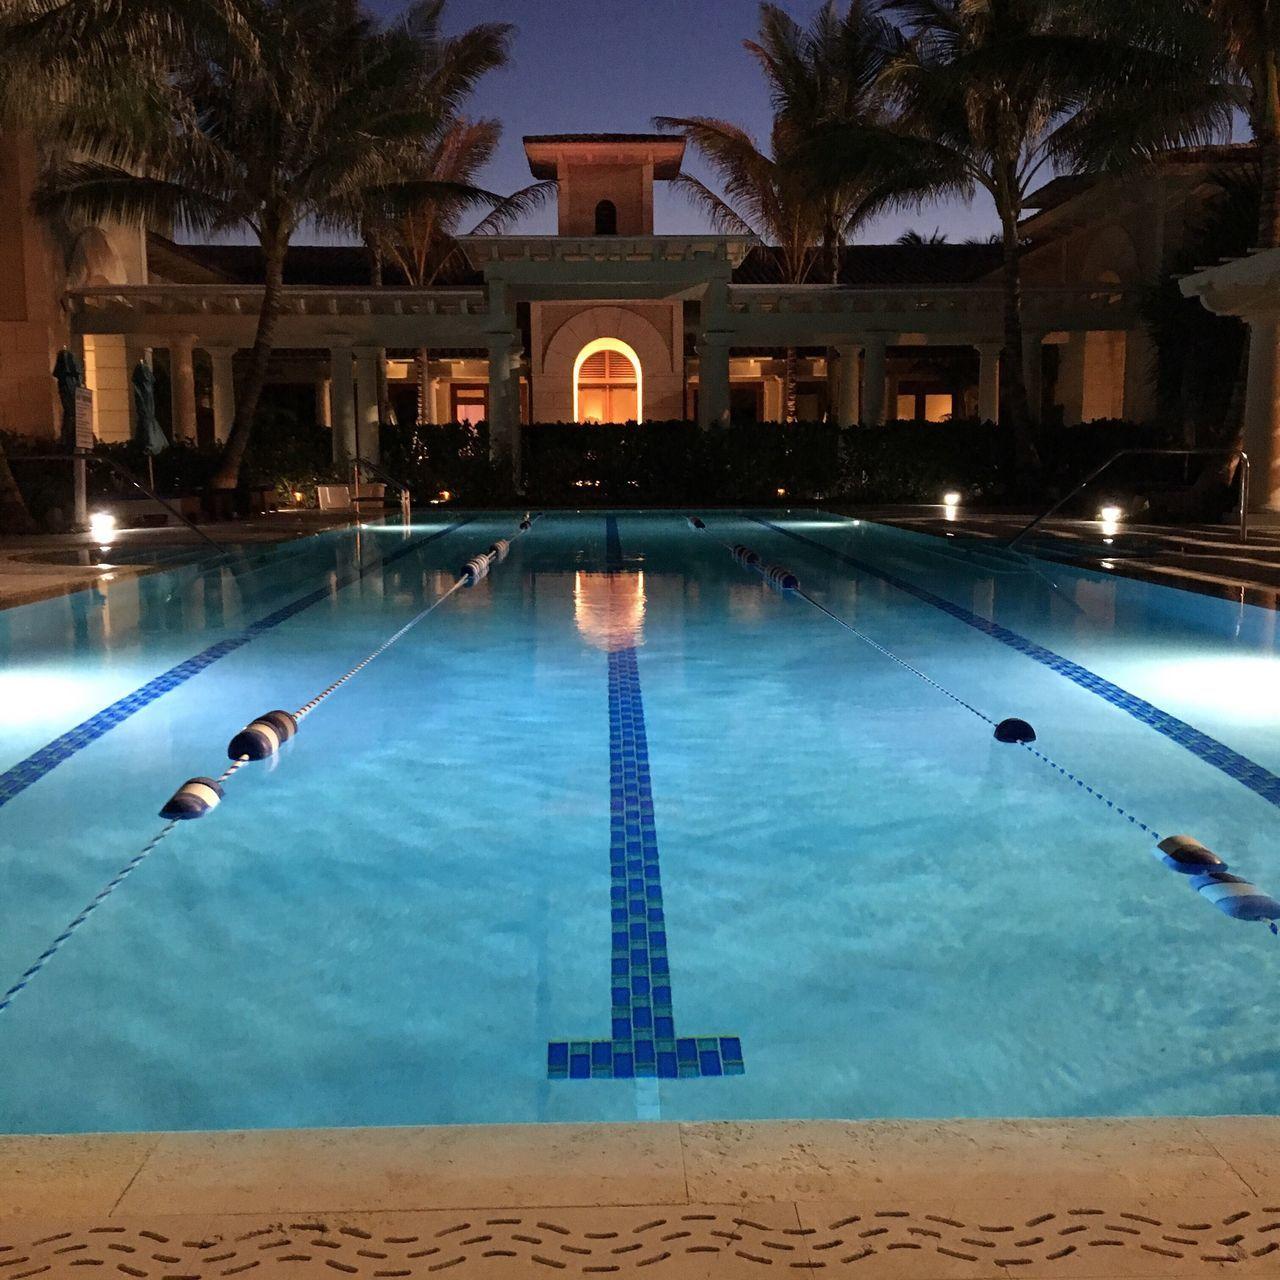 Breakers Hotel Pool Lap Pool Pool At Night Palm Beach Life